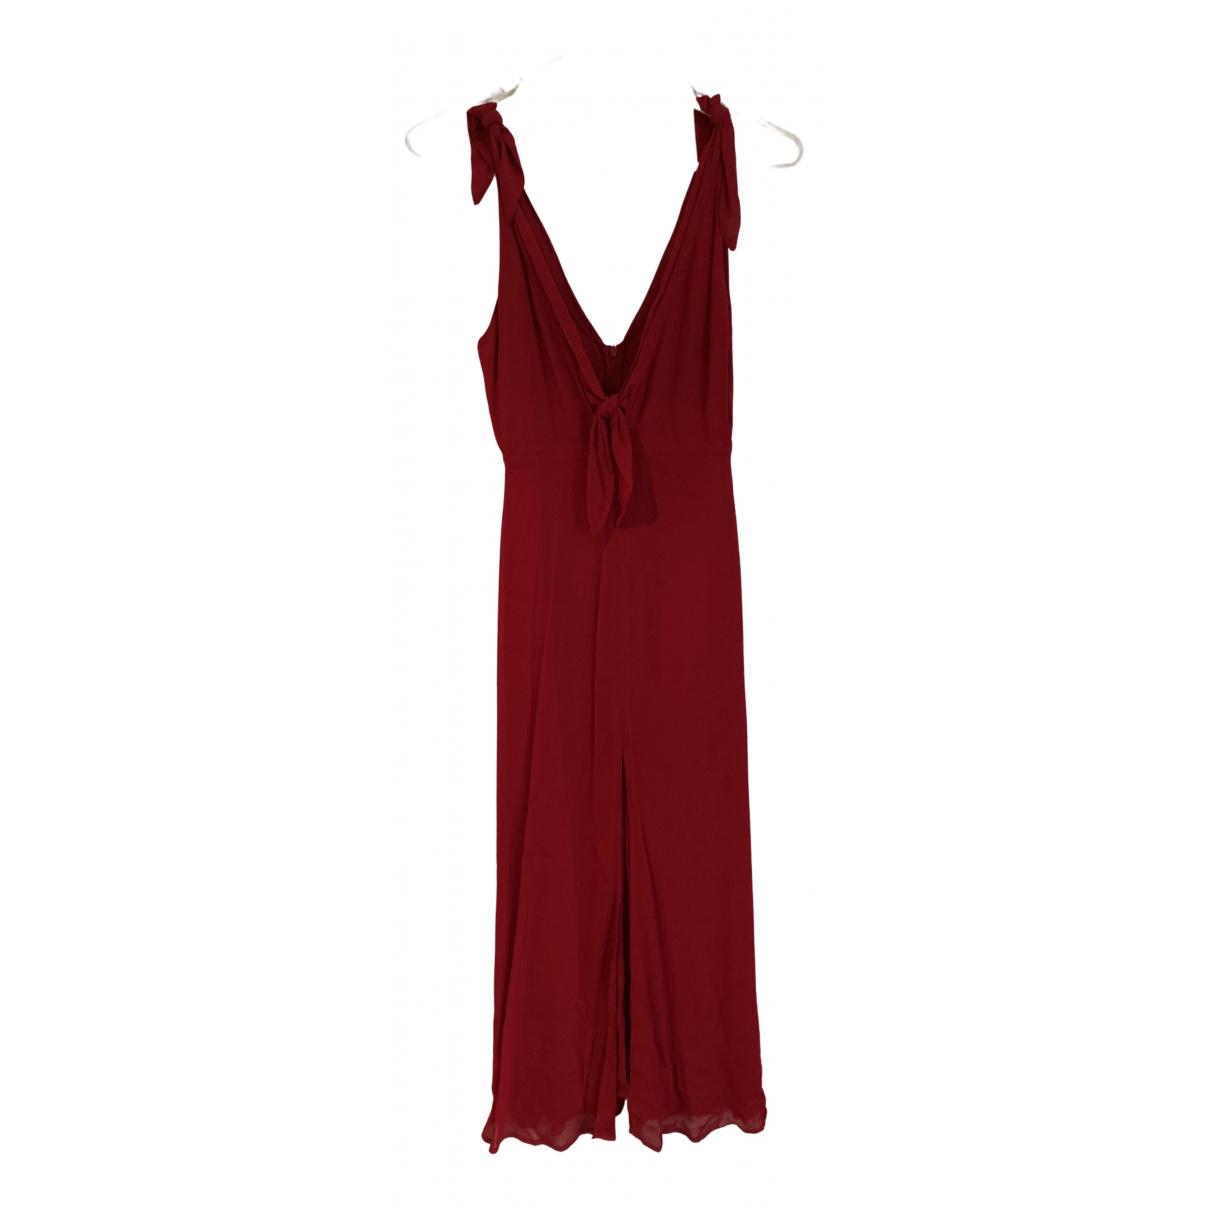 Reformation \N Red dress for Women XS International